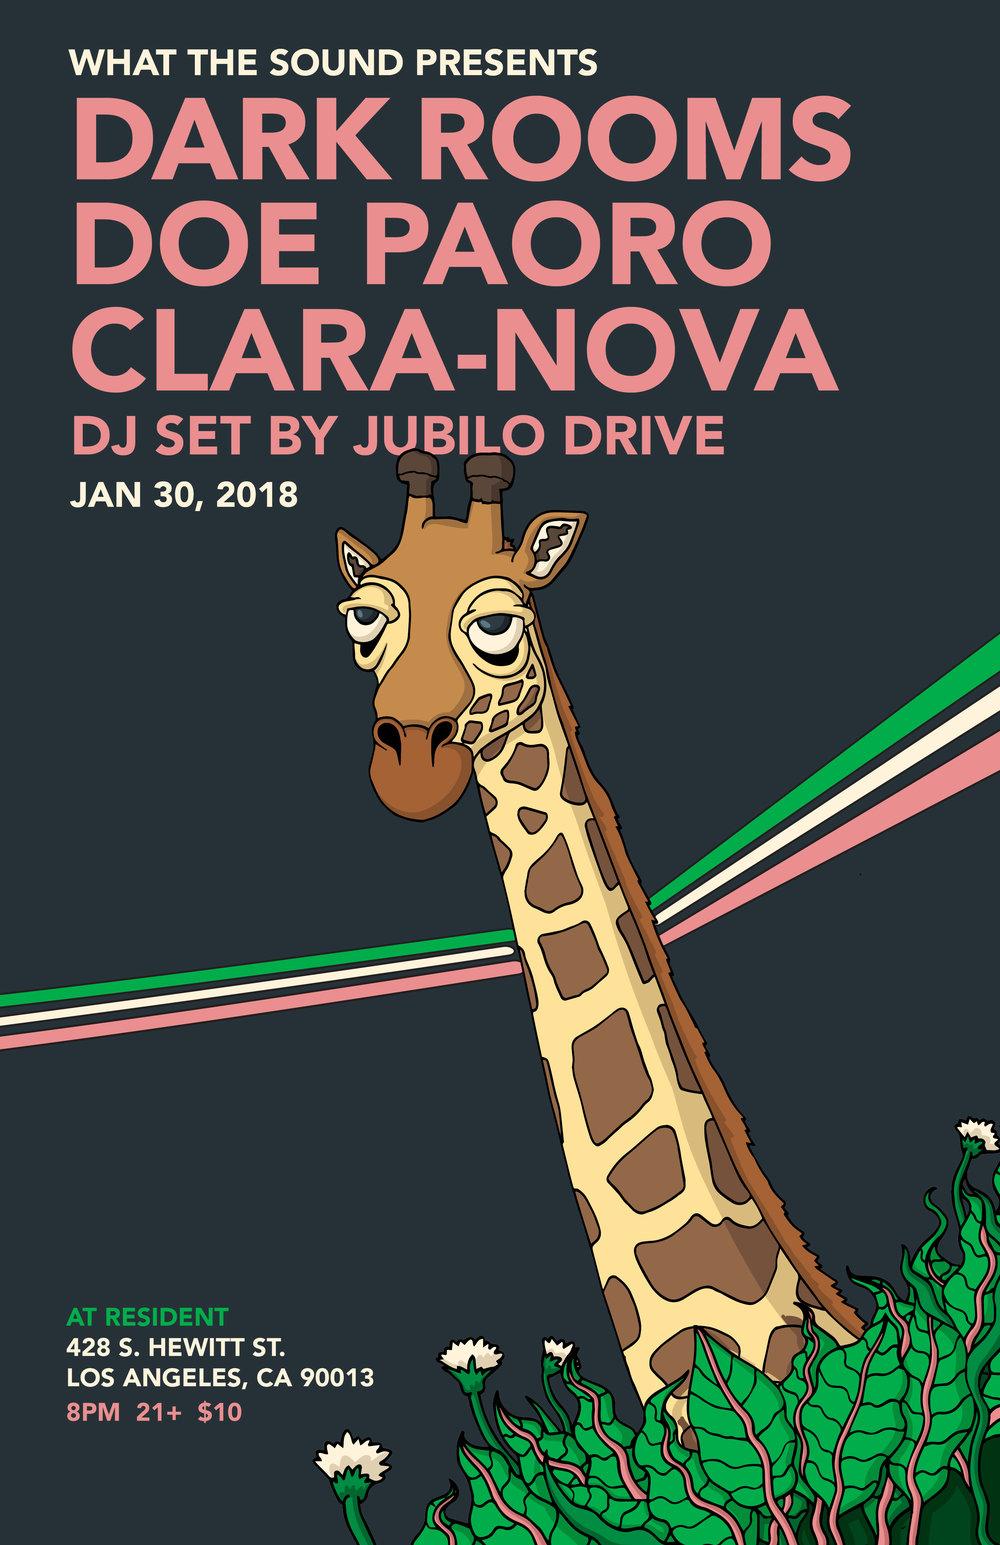 DARK ROOMS / DOE PAORO / CLARA-NOVA / JUBILO DRIVE - Artwork by Riley SavageJanuary 30 @ Resident$10, 21+